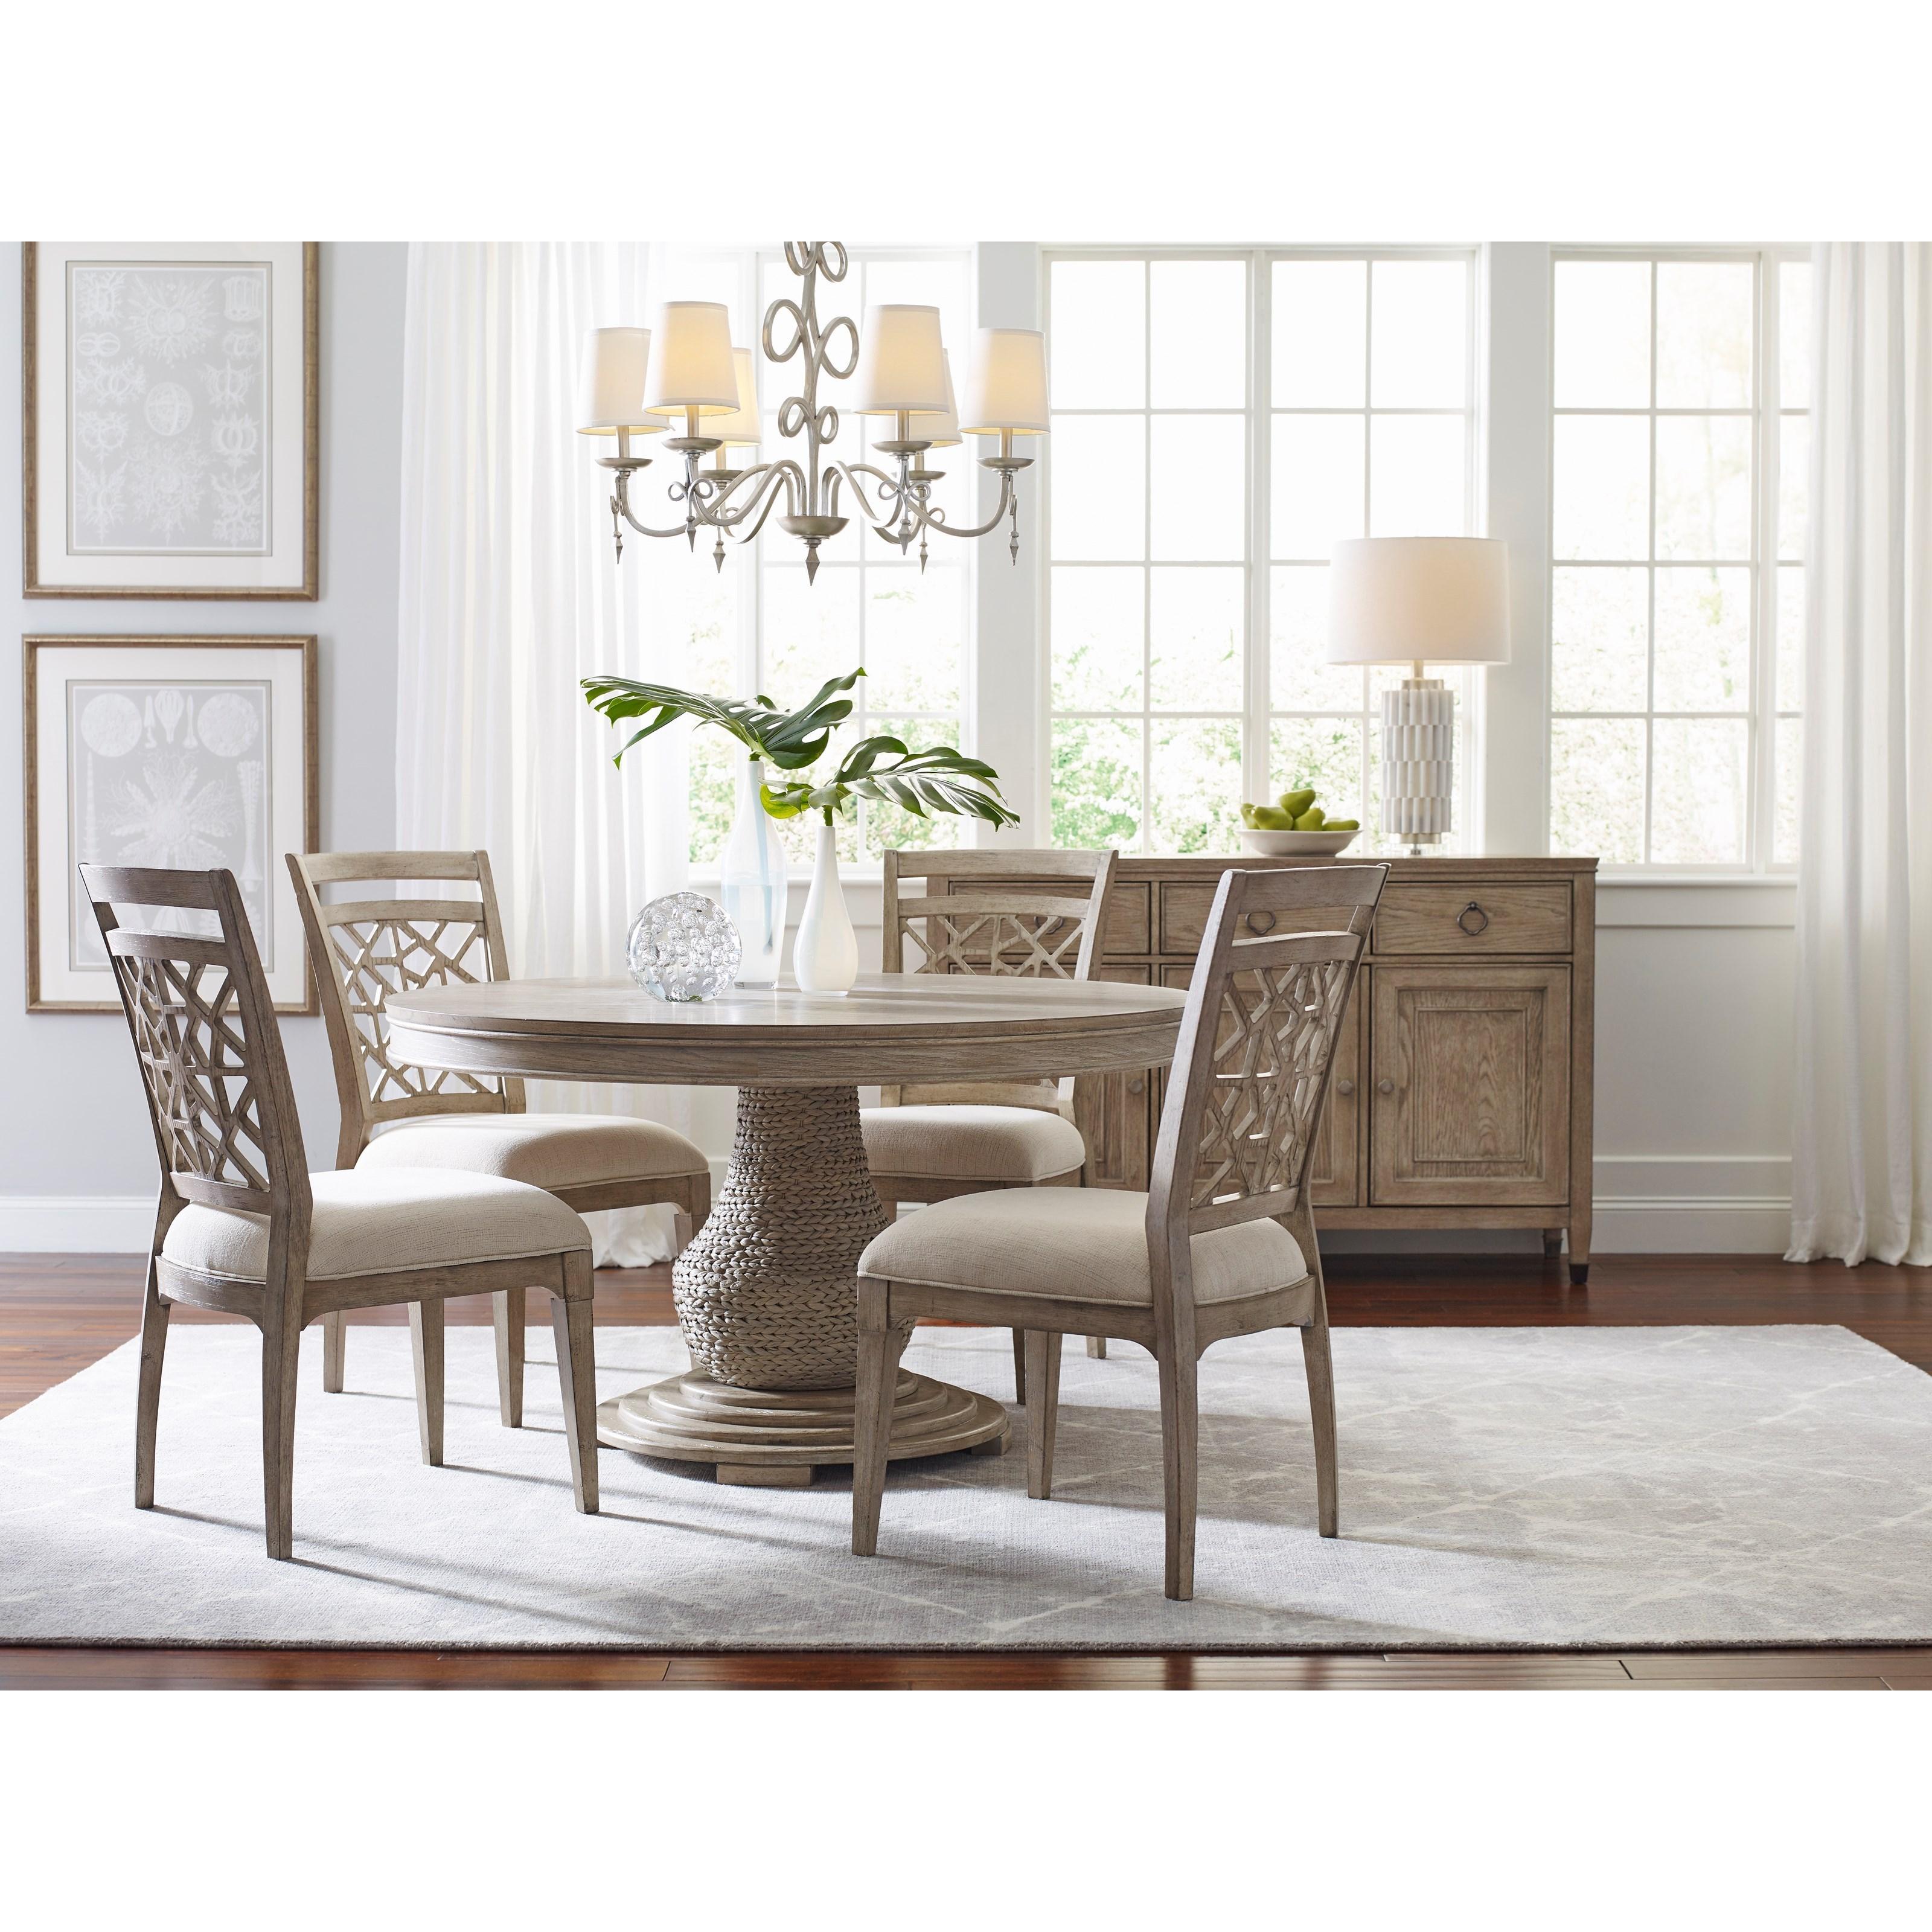 living trends vista casual dining room group sprintz. Black Bedroom Furniture Sets. Home Design Ideas